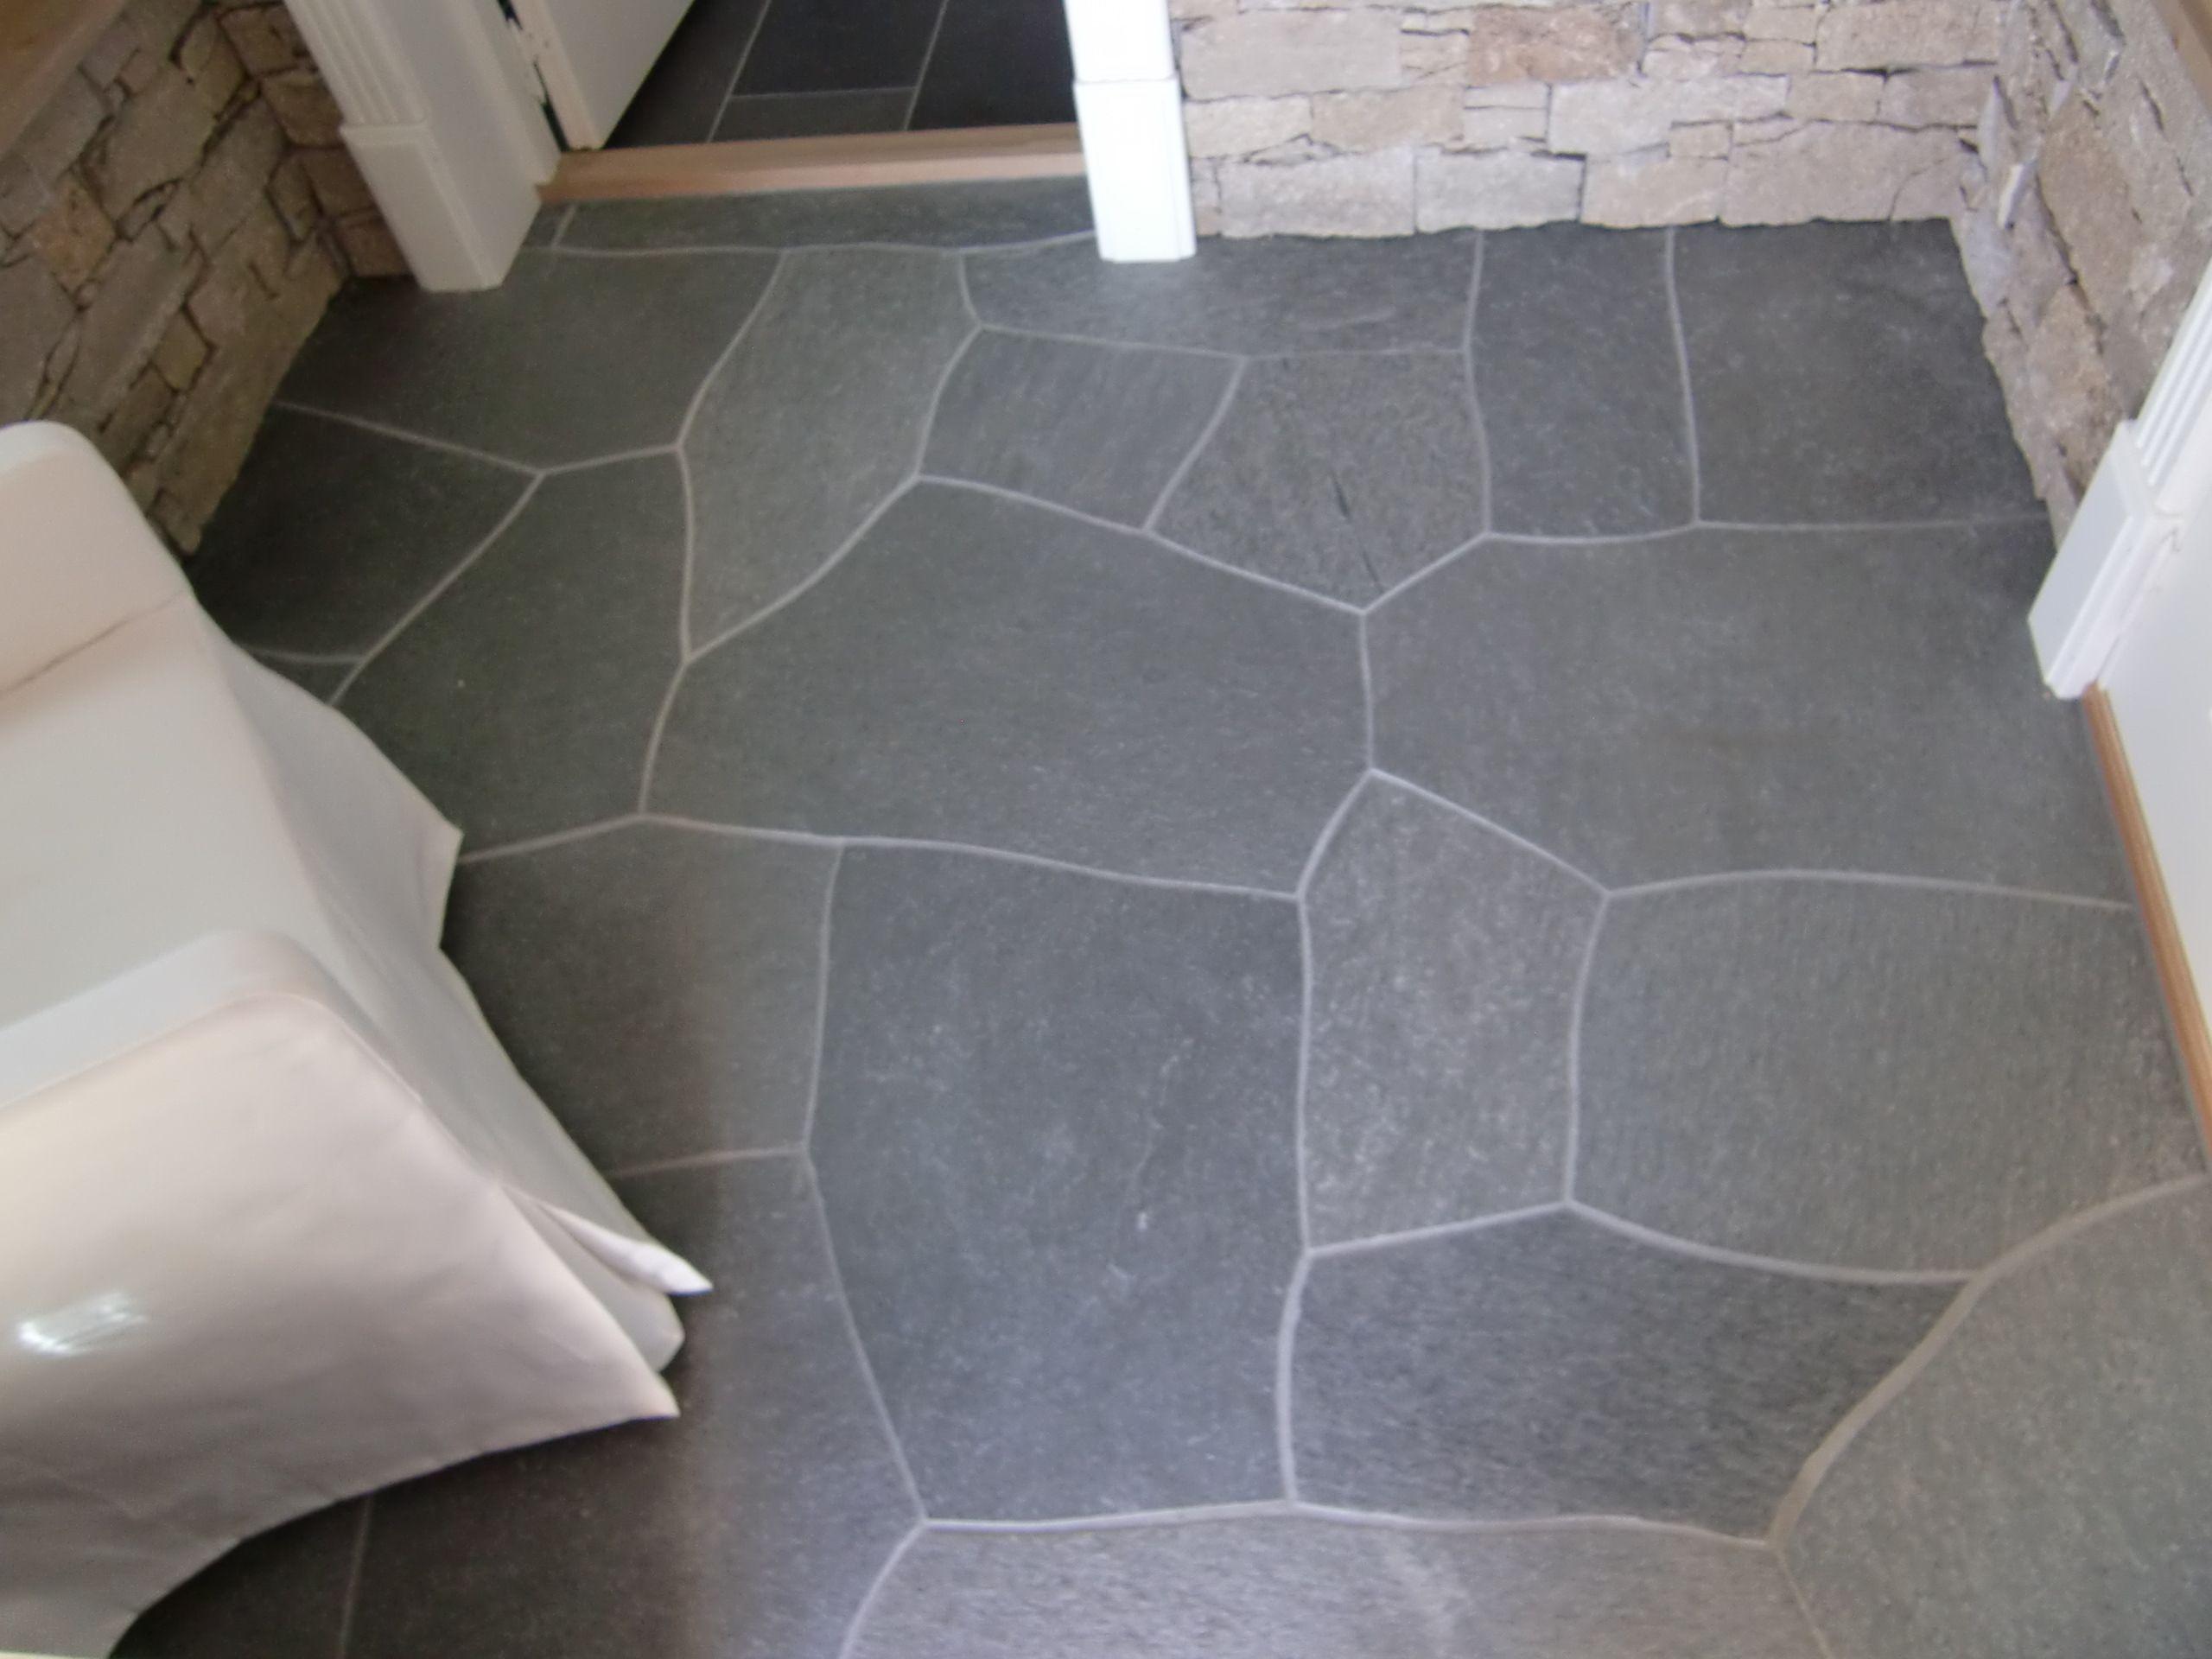 naturstein gulv google sà k gulvmaterialer pinterest ricerca